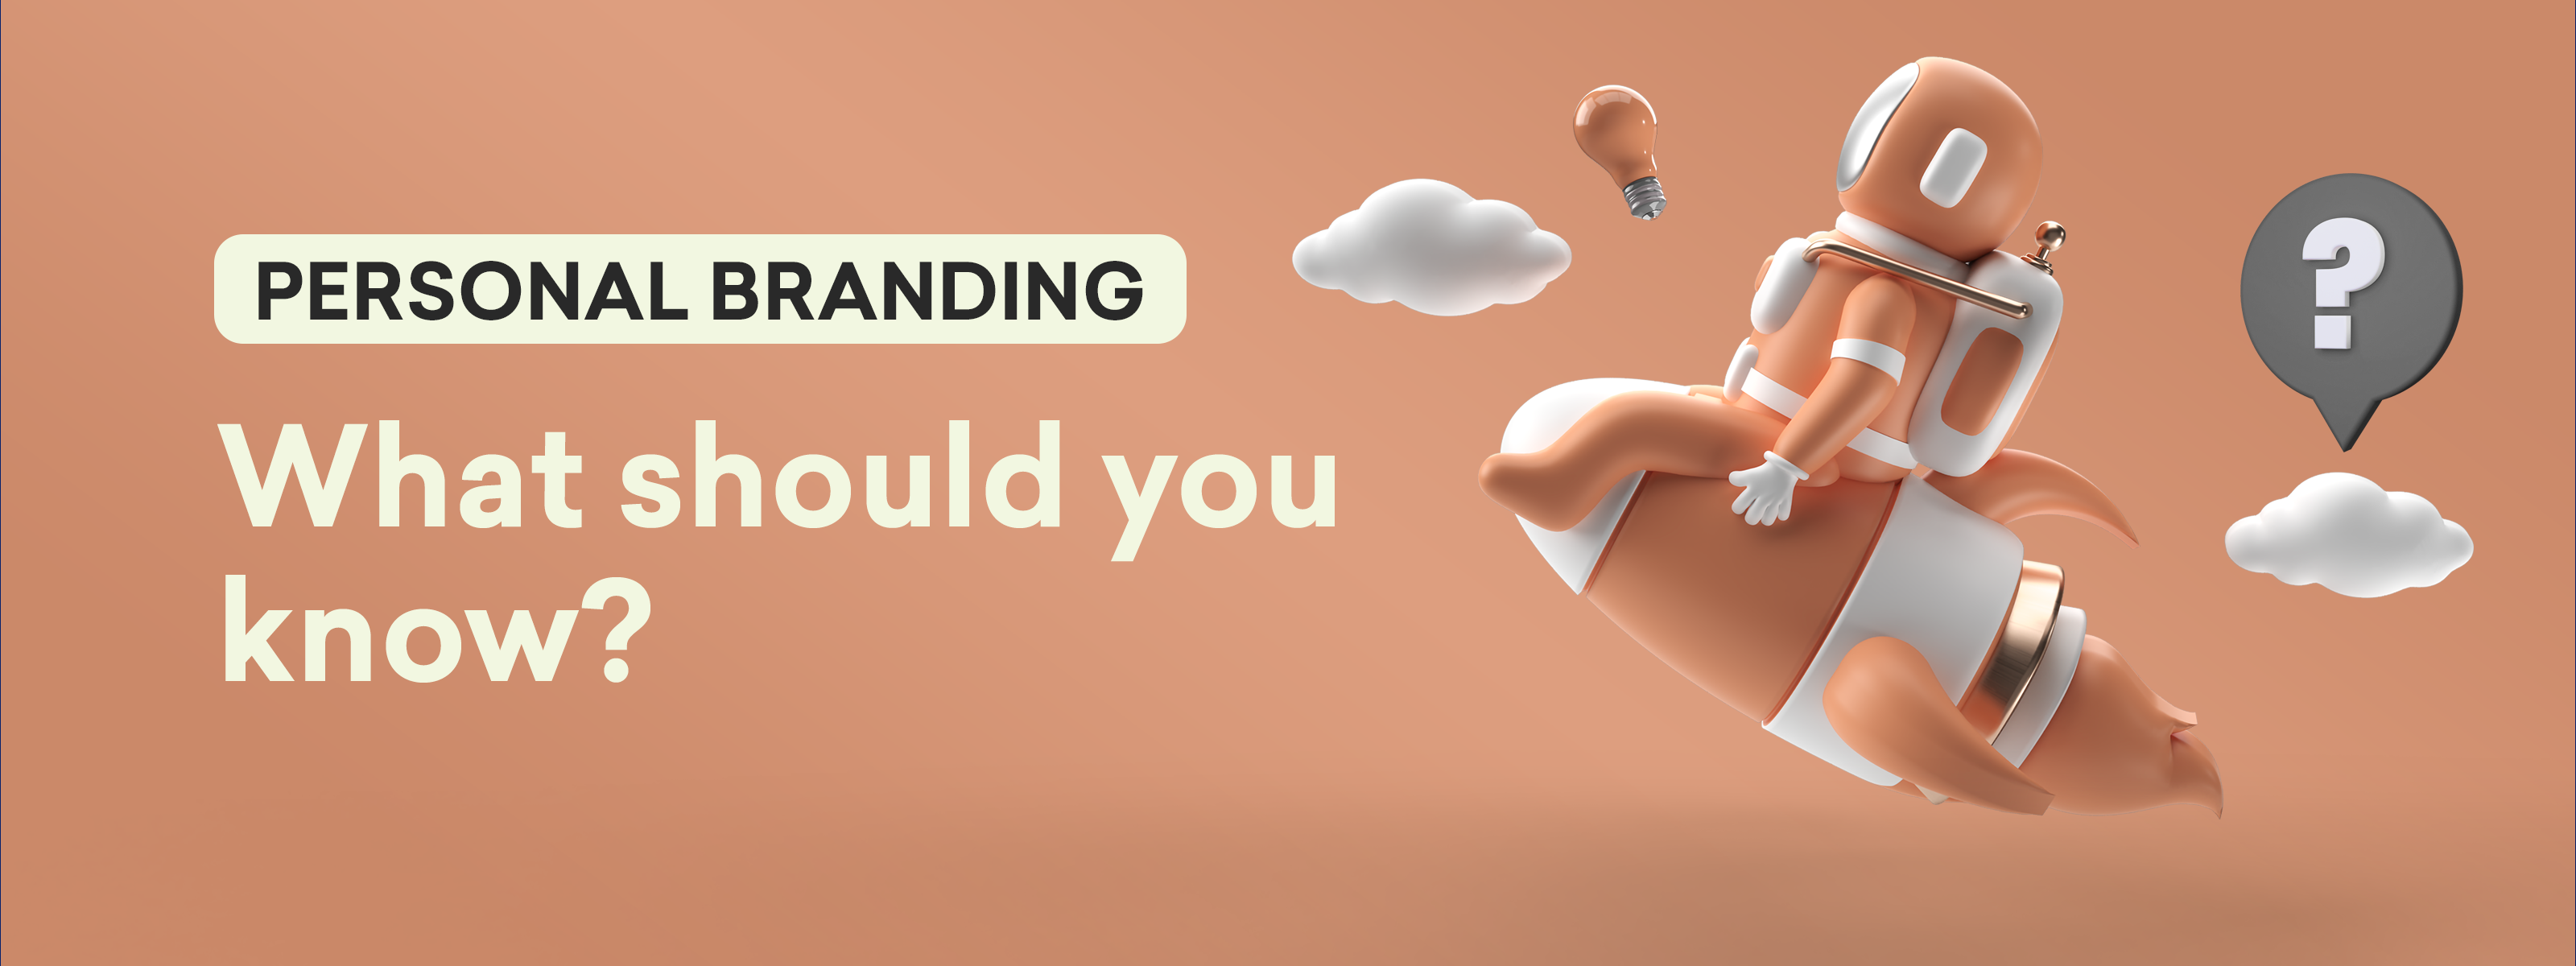 Personal Branding in 2021